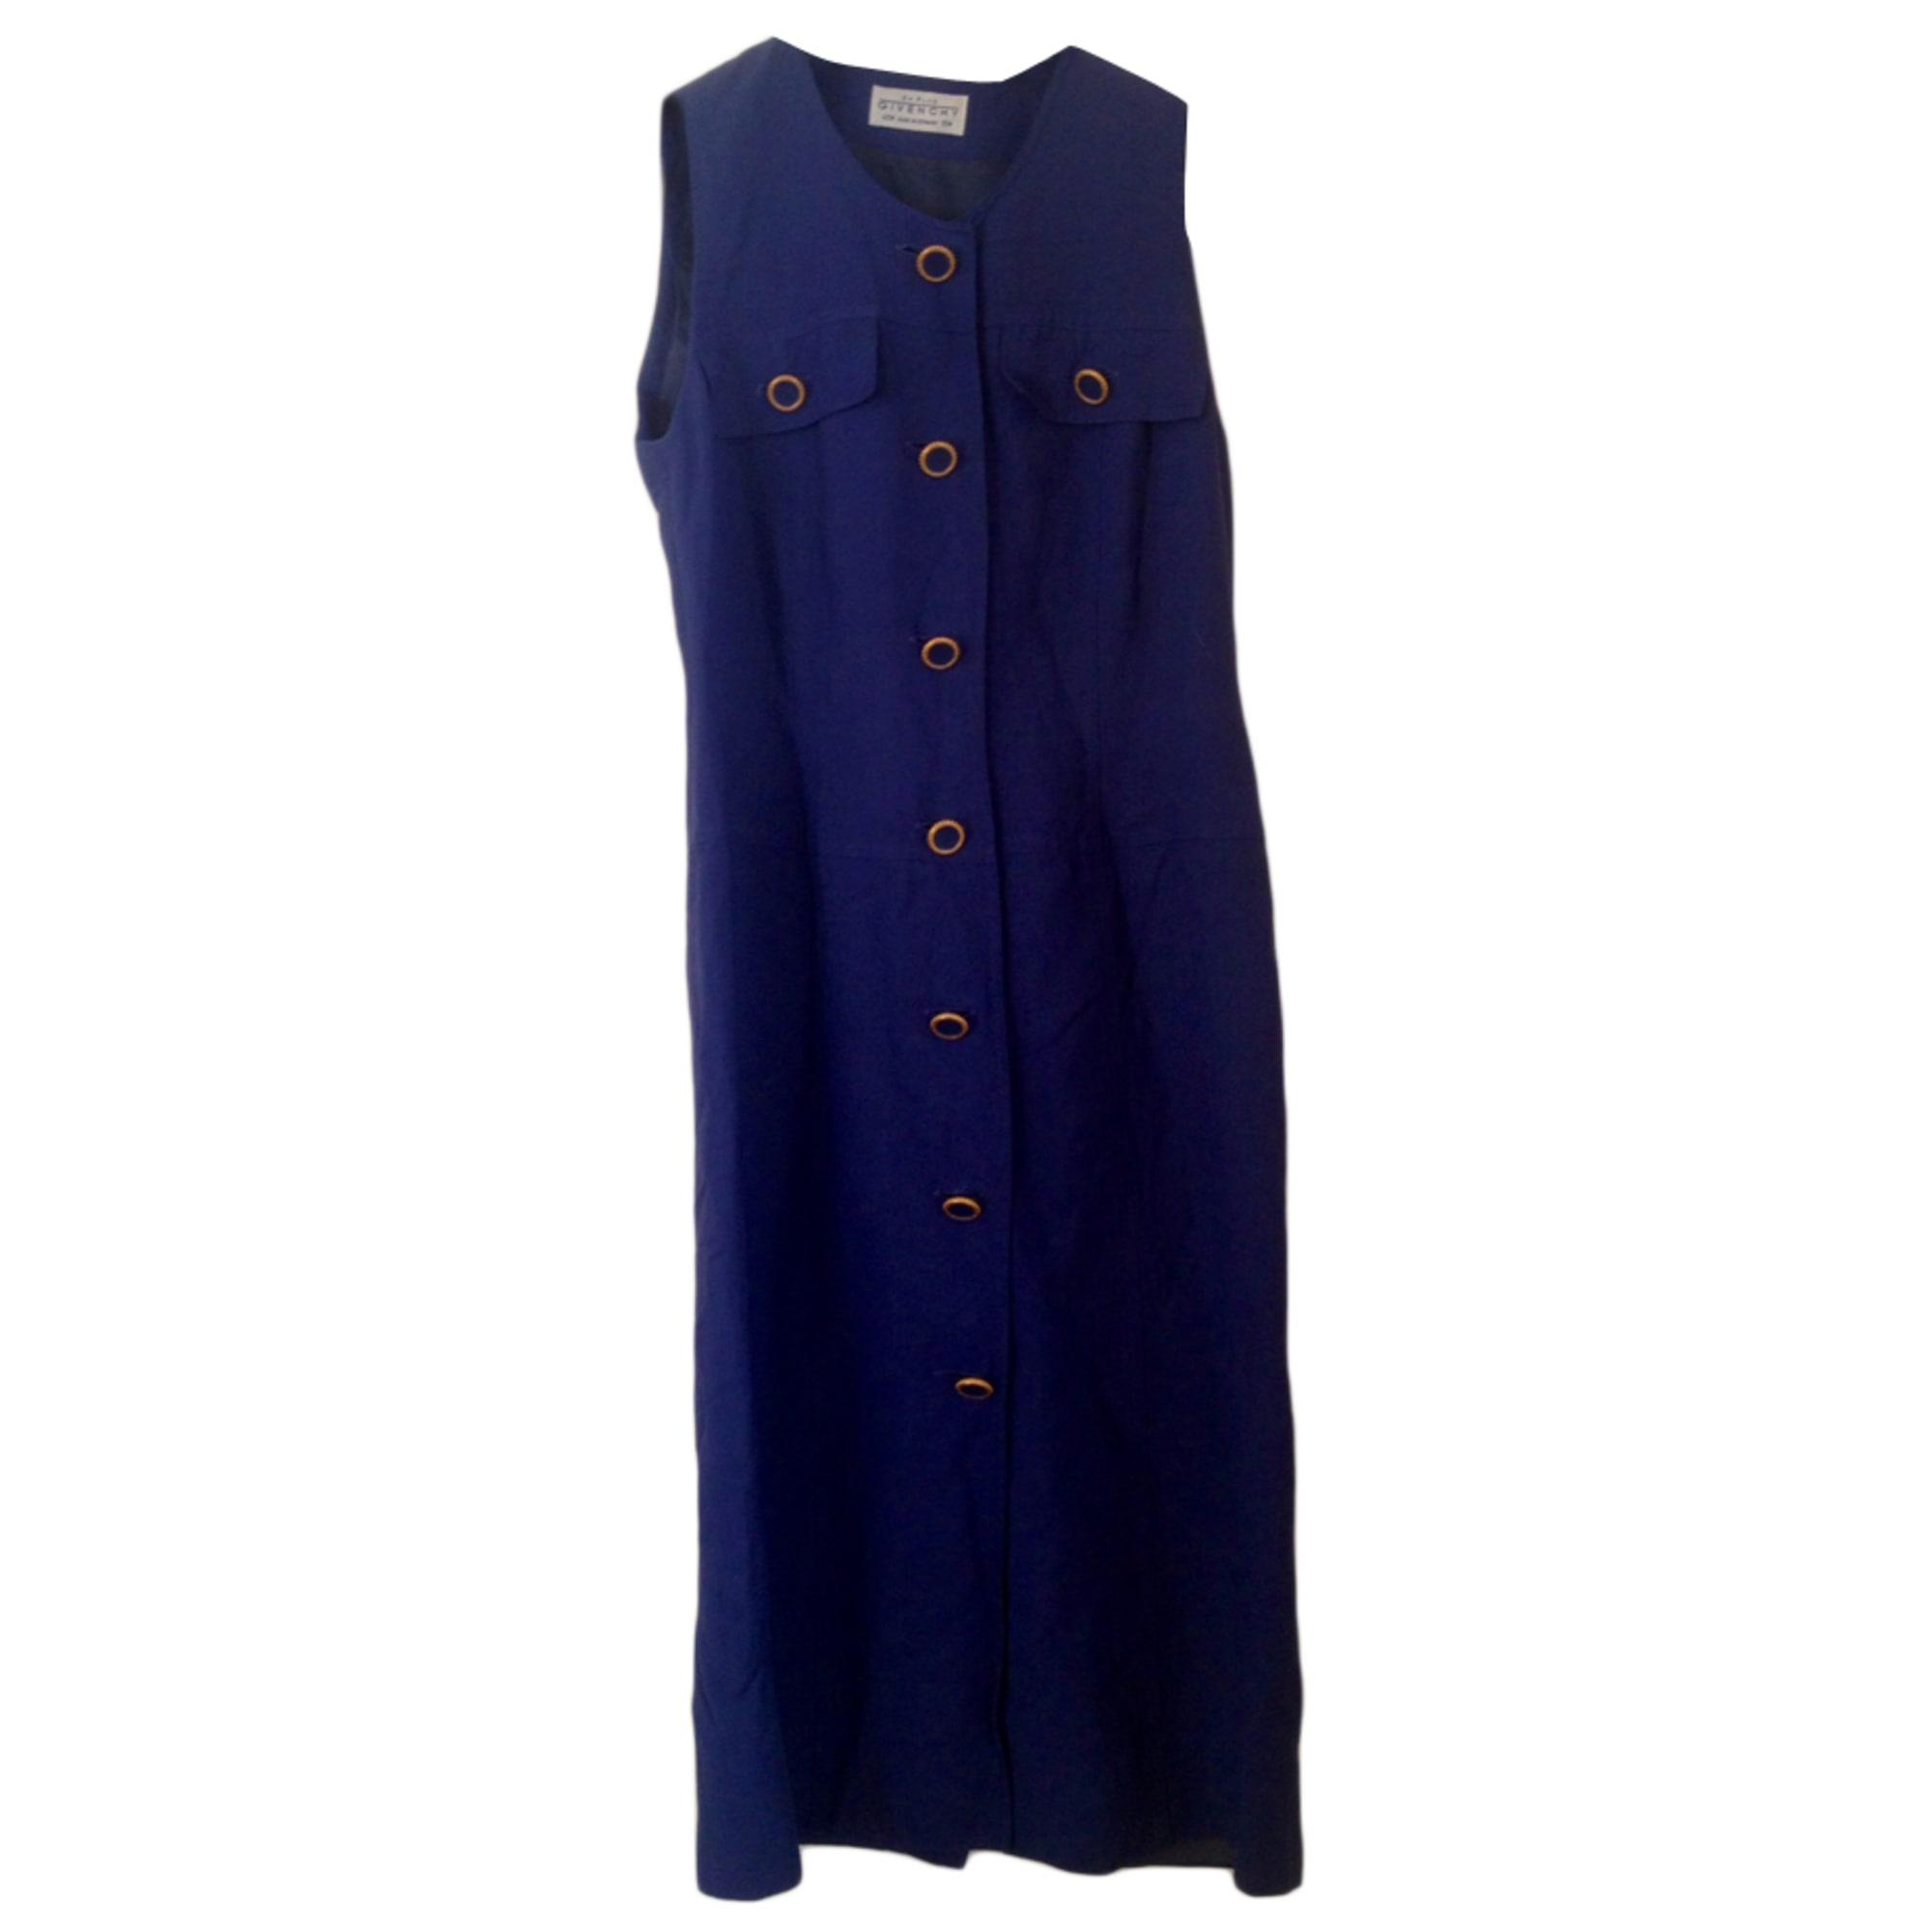 861ebc8bc3a Robe longue GIVENCHY 40 (L